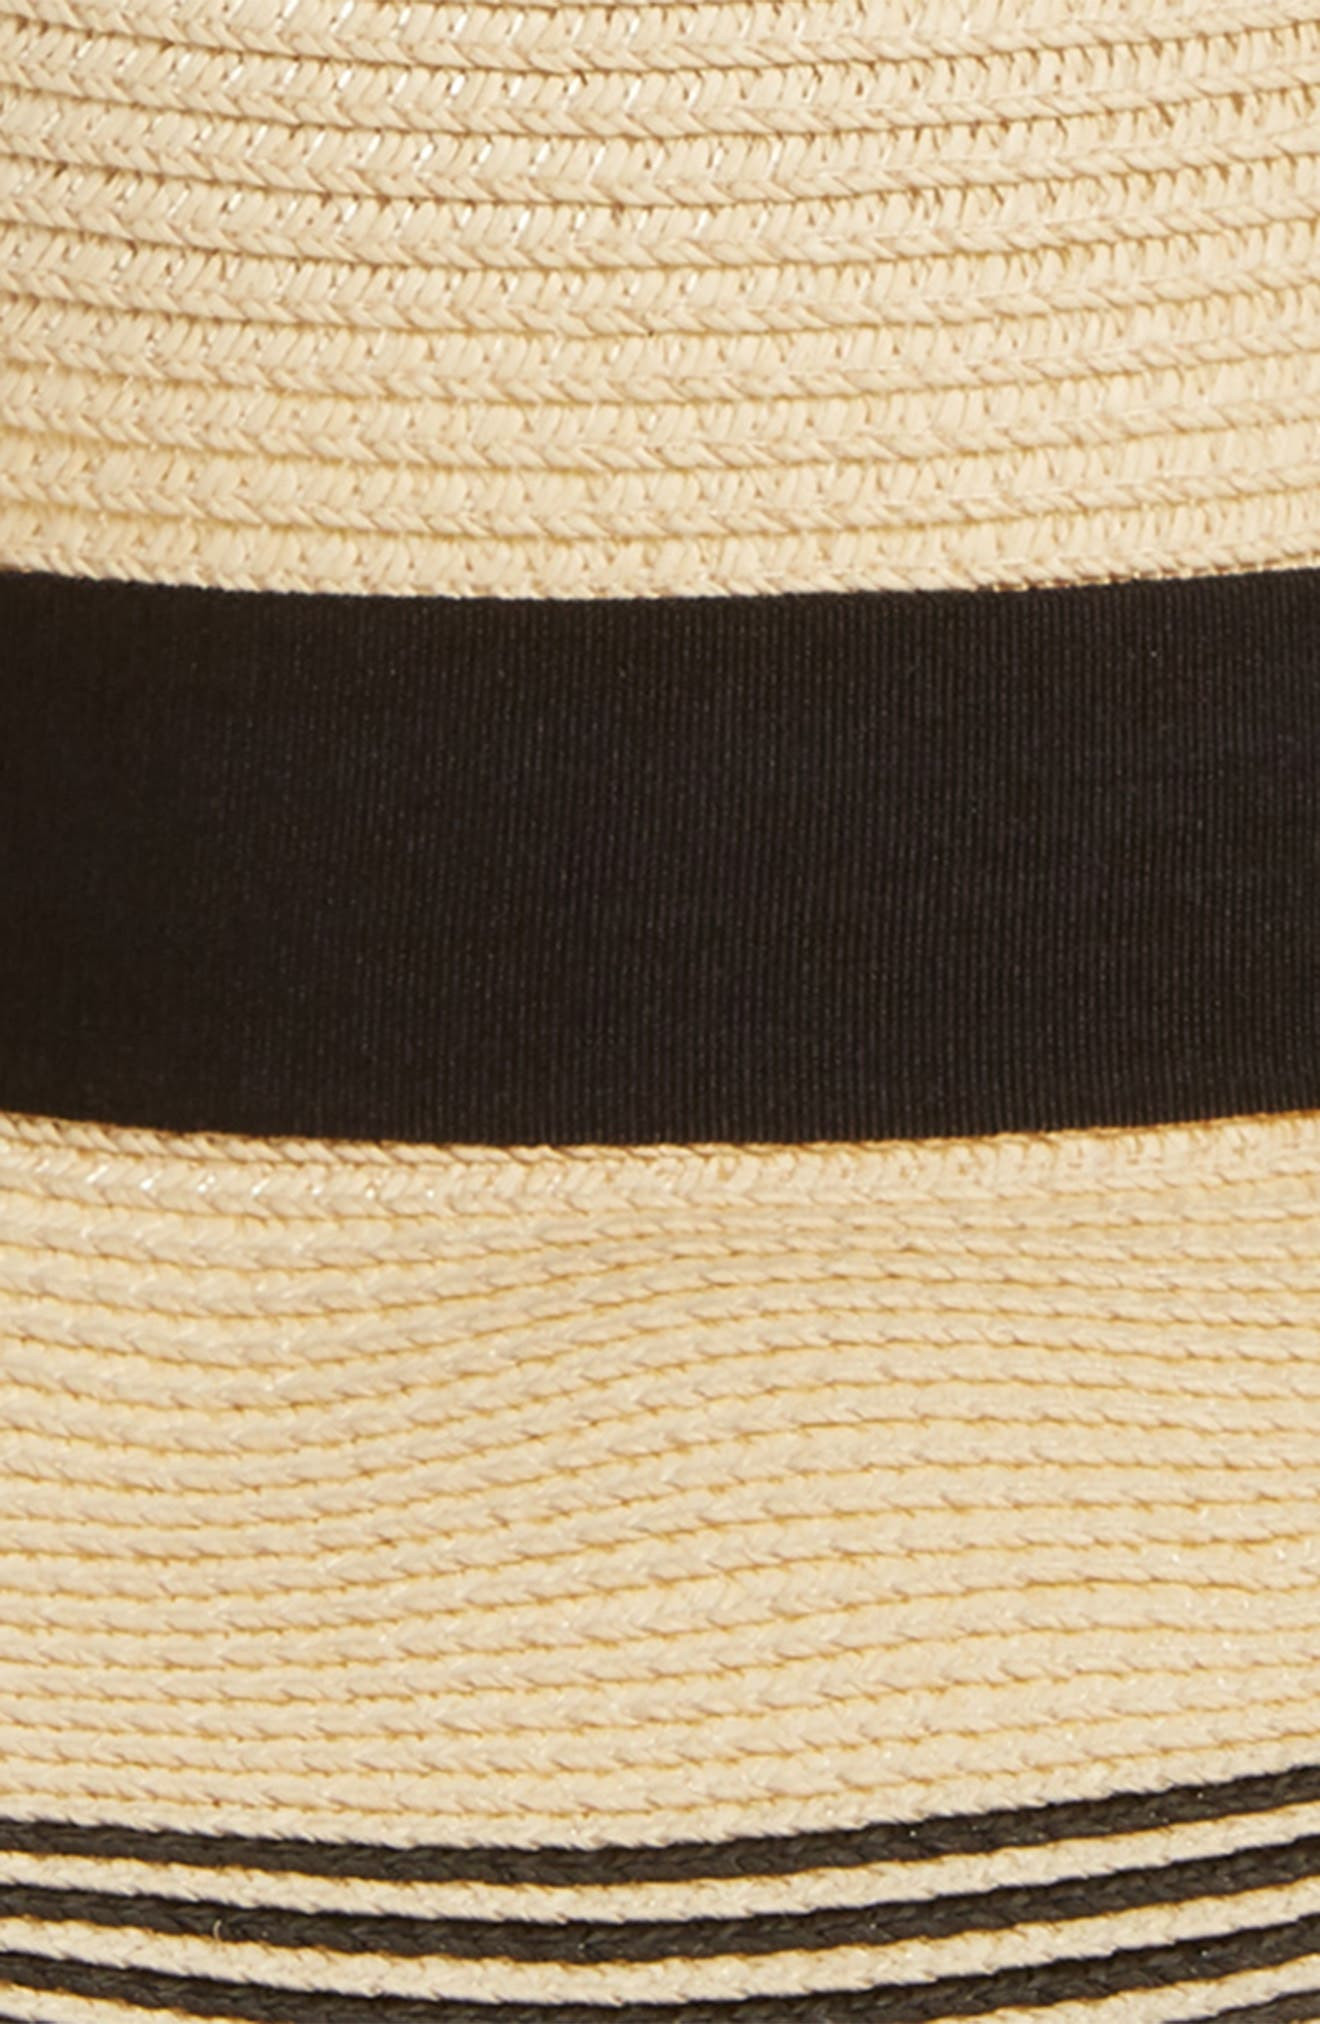 Stripe Brim Straw Hat,                             Alternate thumbnail 2, color,                             250